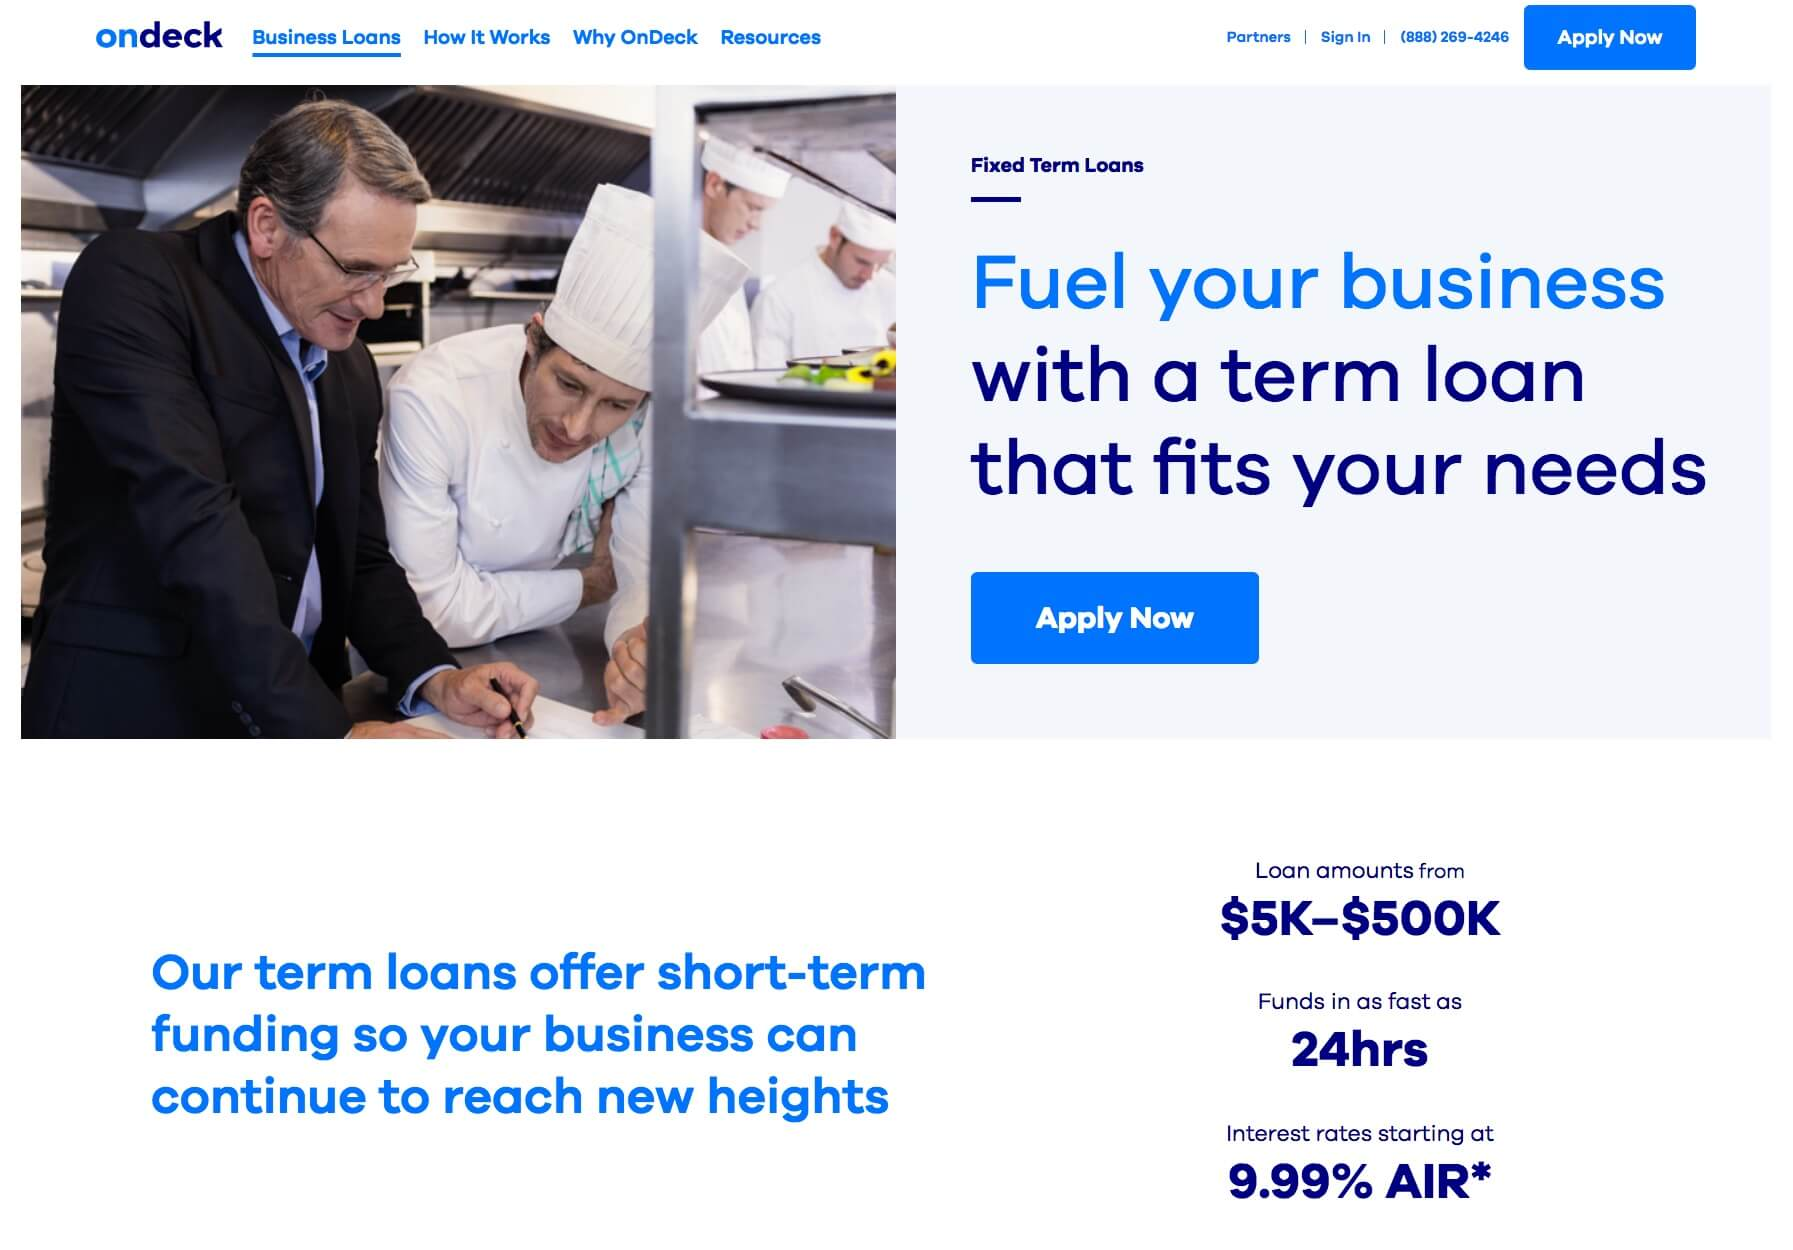 ondeck loans